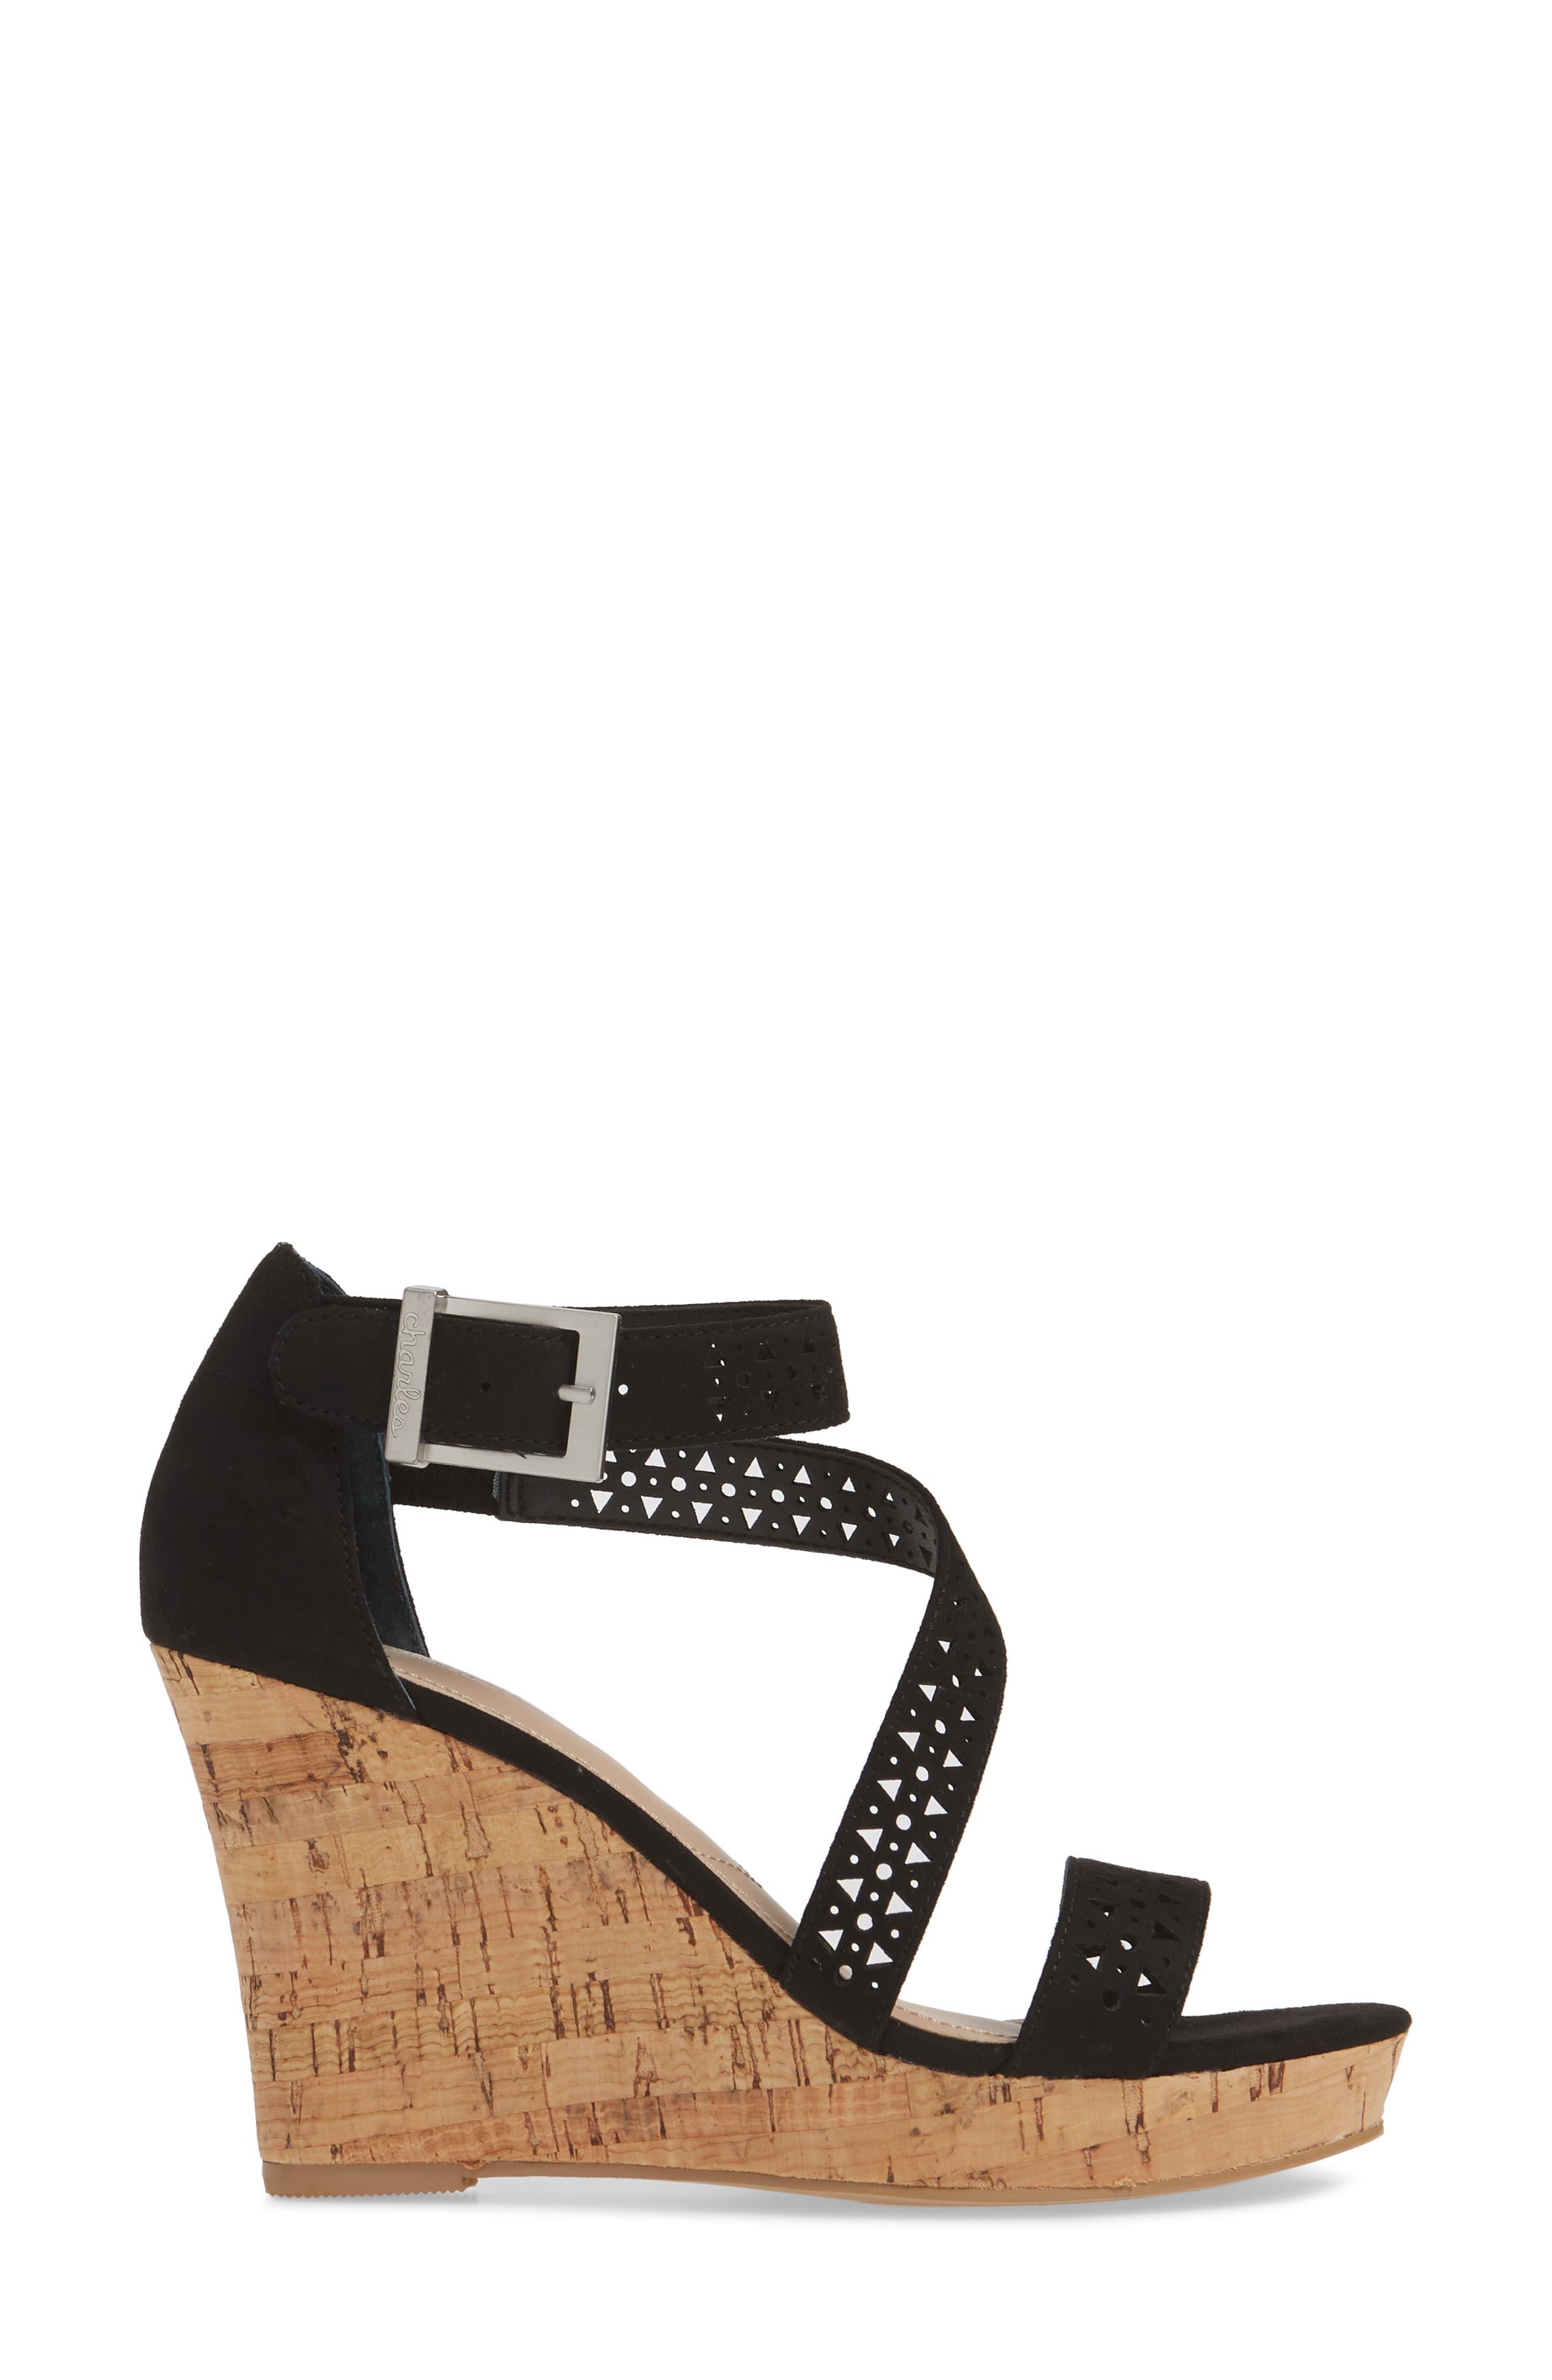 Landon Perforated Wedge Sandal,                             Alternate thumbnail 3, color,                             BLACK FABRIC